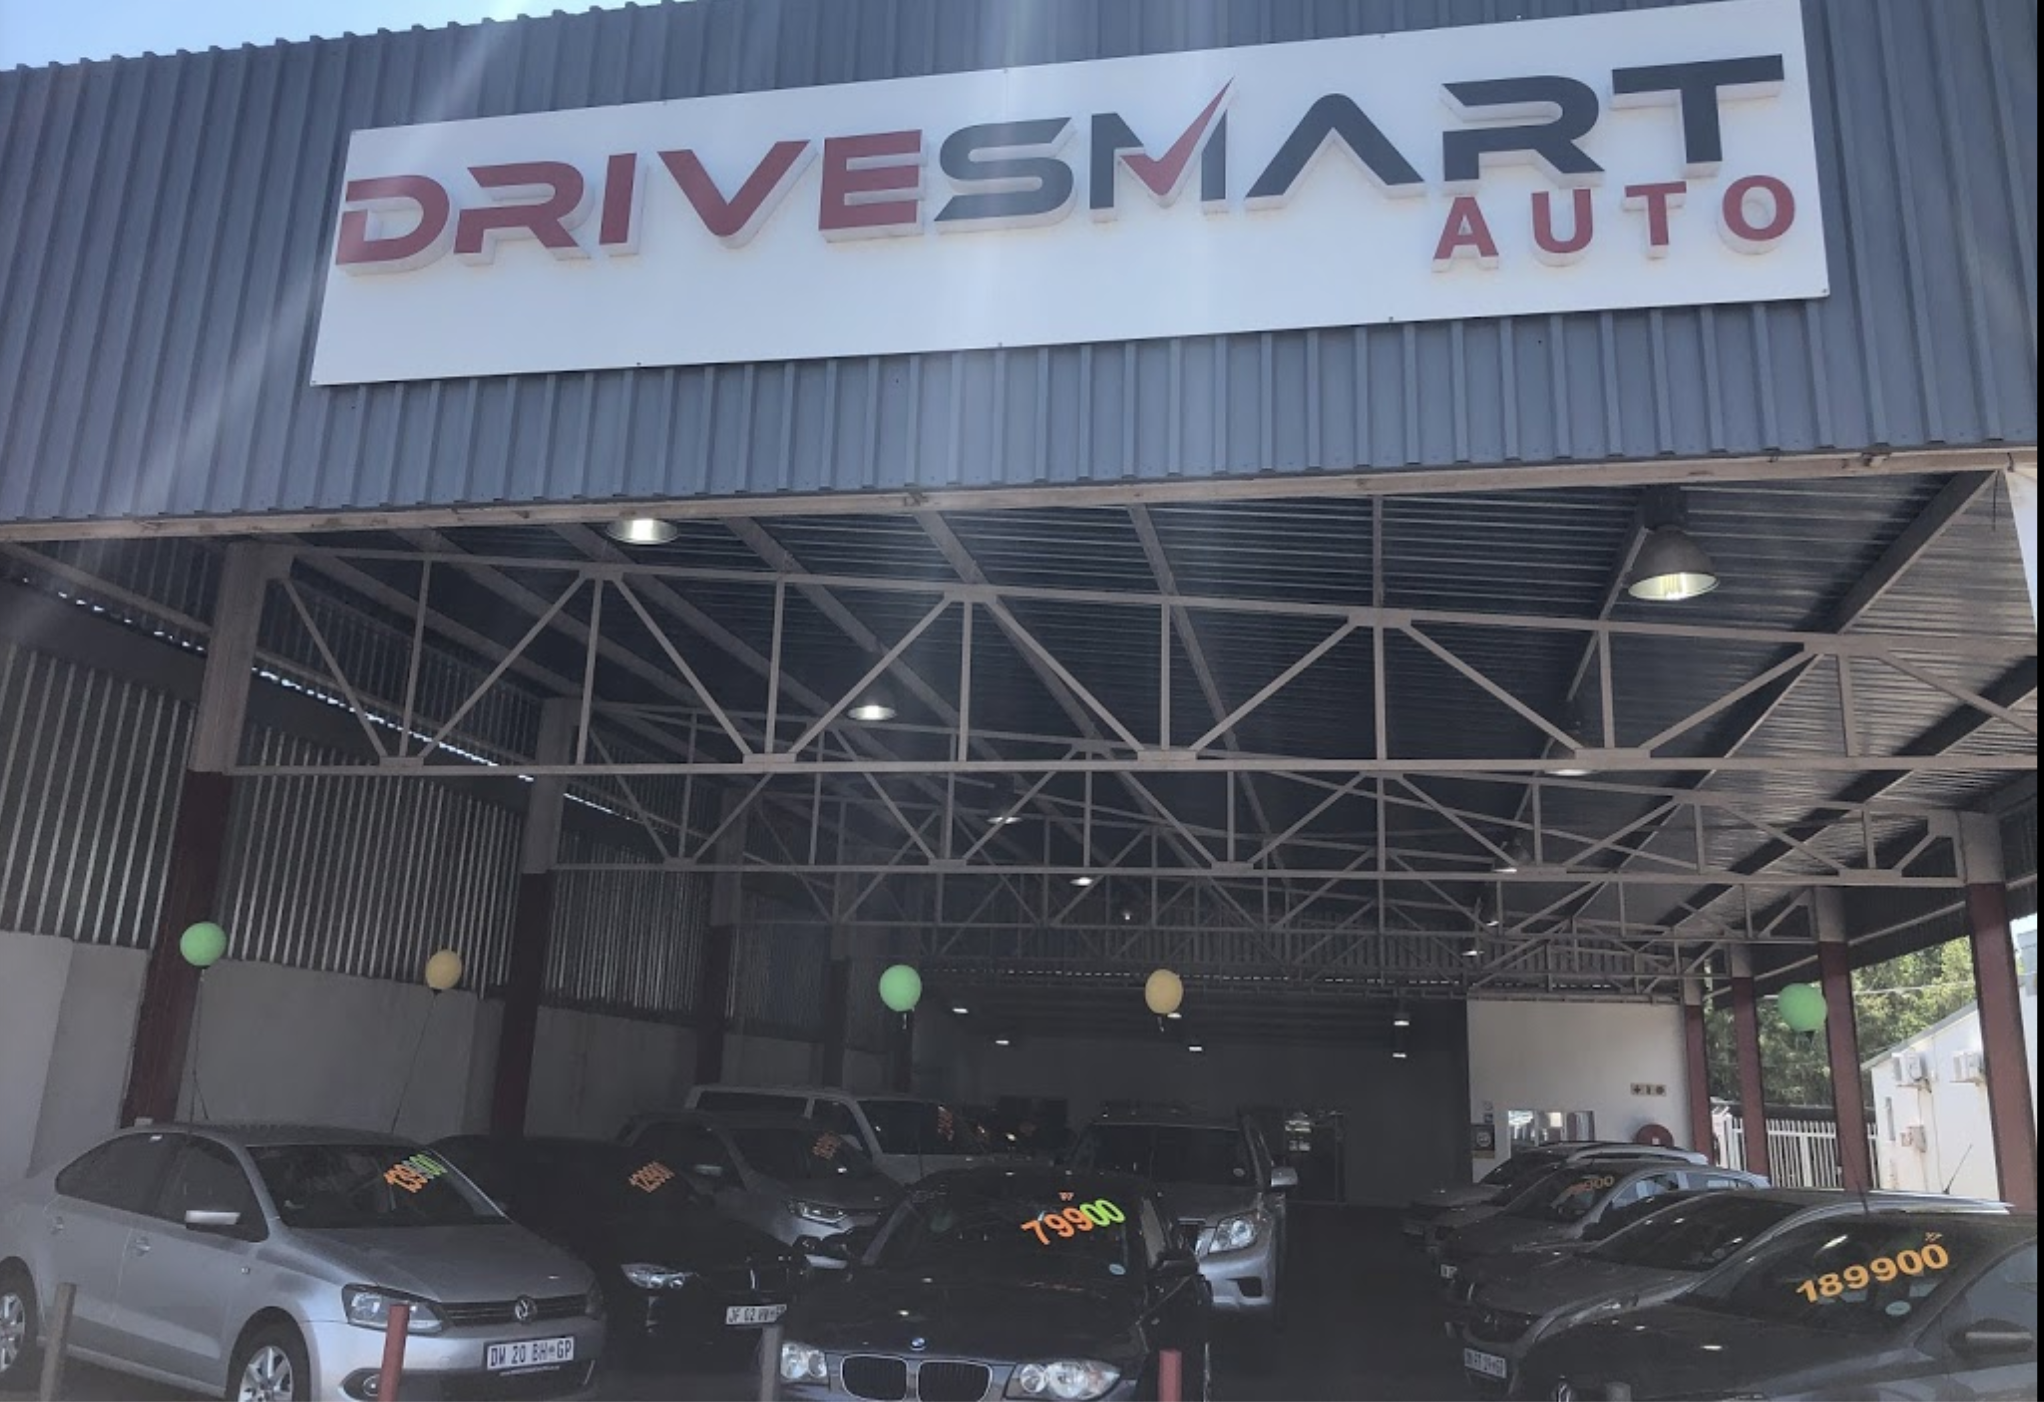 Drive smart auto